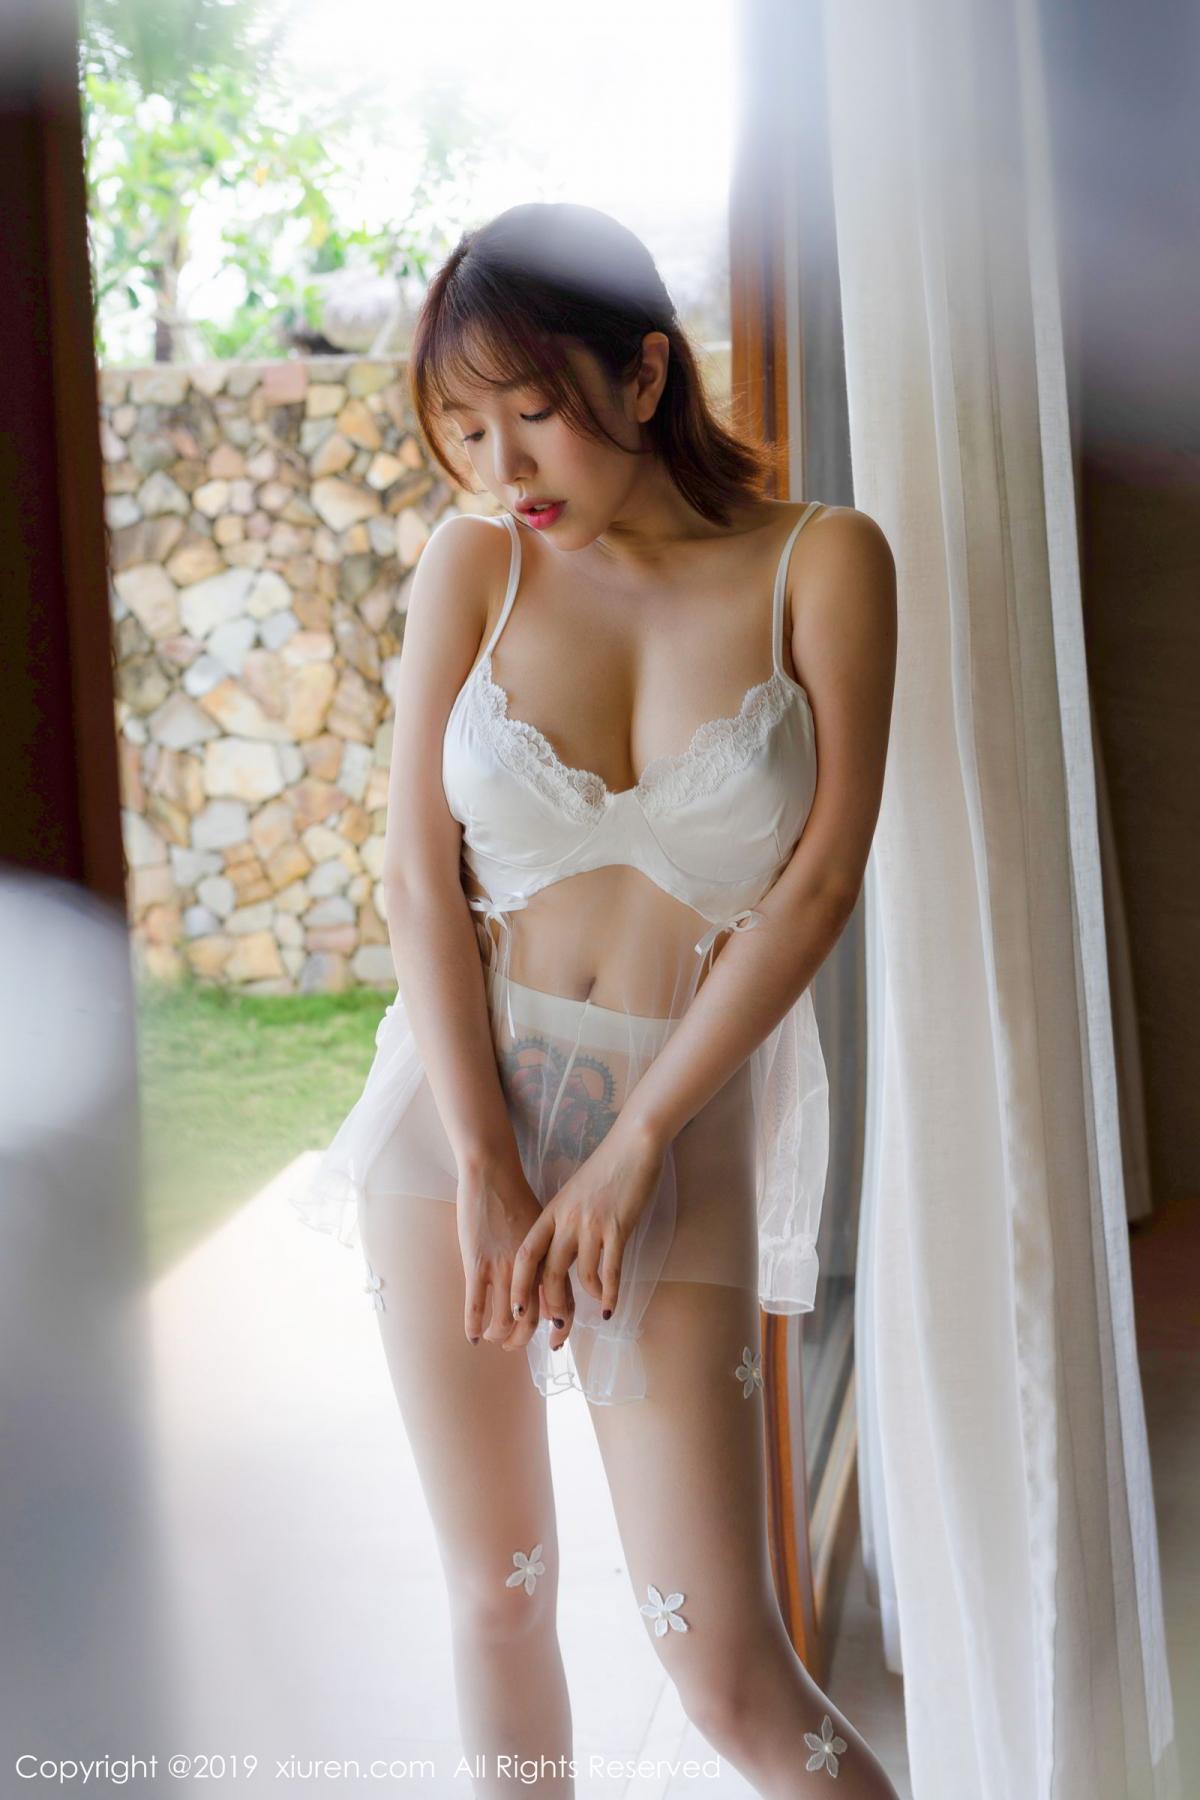 [XiuRen] Vol.1578 Huang Le Ran 2P, Huang Le Ran, Underwear, Xiuren